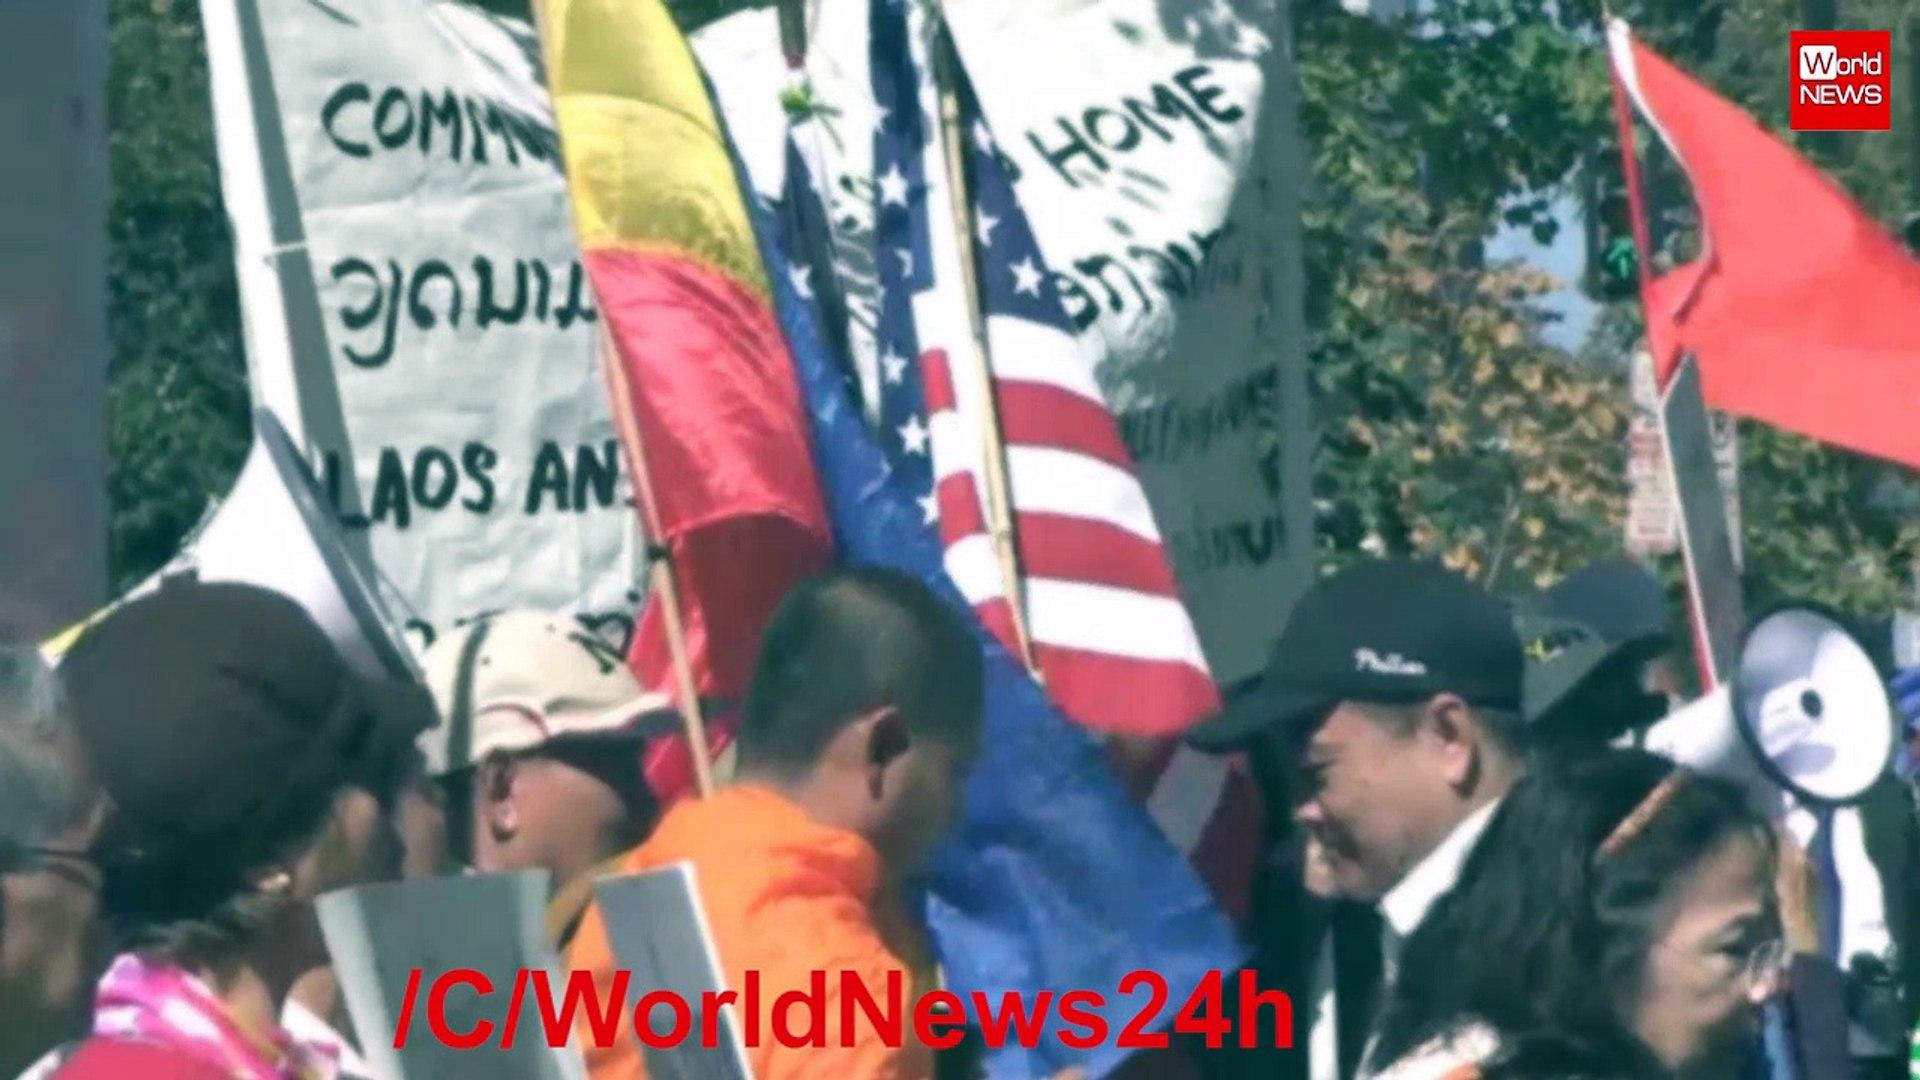 TIN TỨC 24/7: THỜI SỰ HOA KỲ - Nga can thiệp bầu cử Hoa kỳ